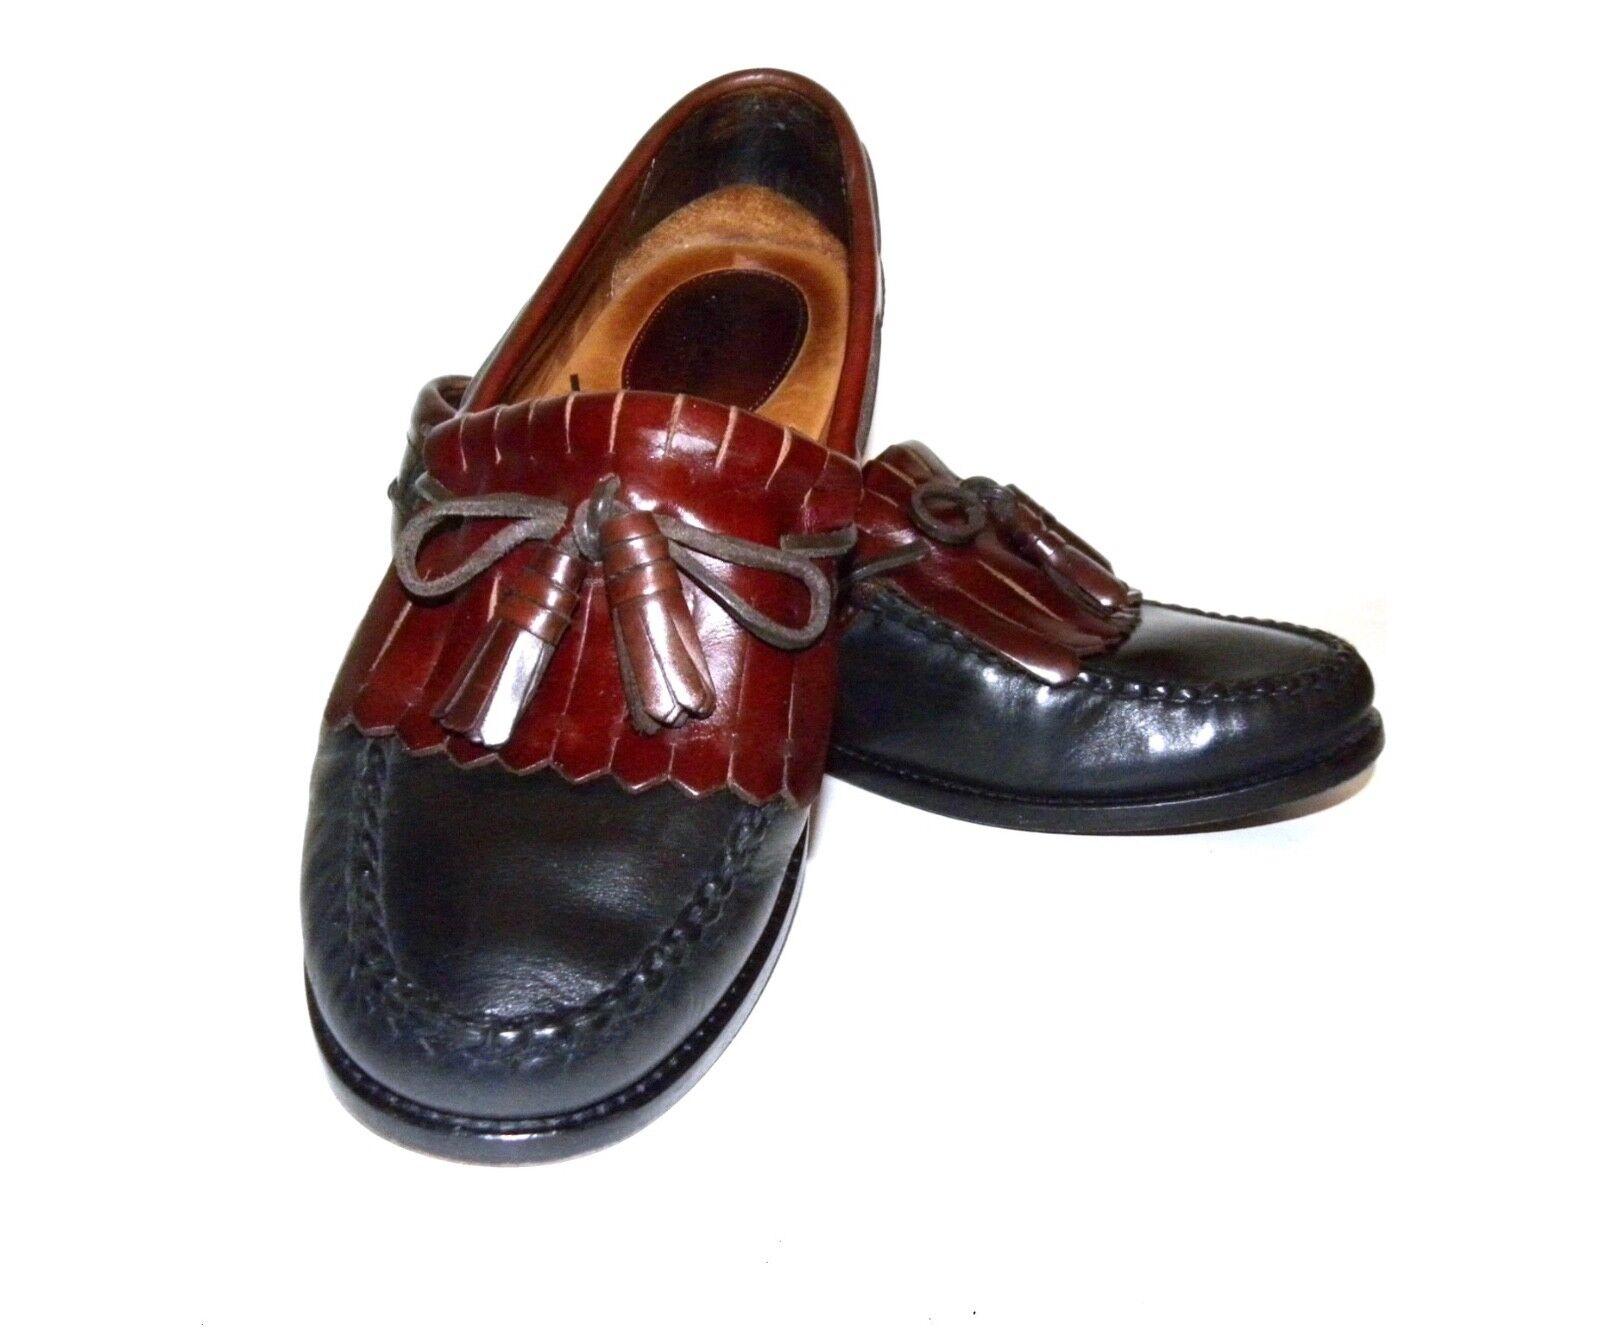 Johnston & Murphy Kiltie Tassel Loafer Oxblood Burgundy Black MEN size 10